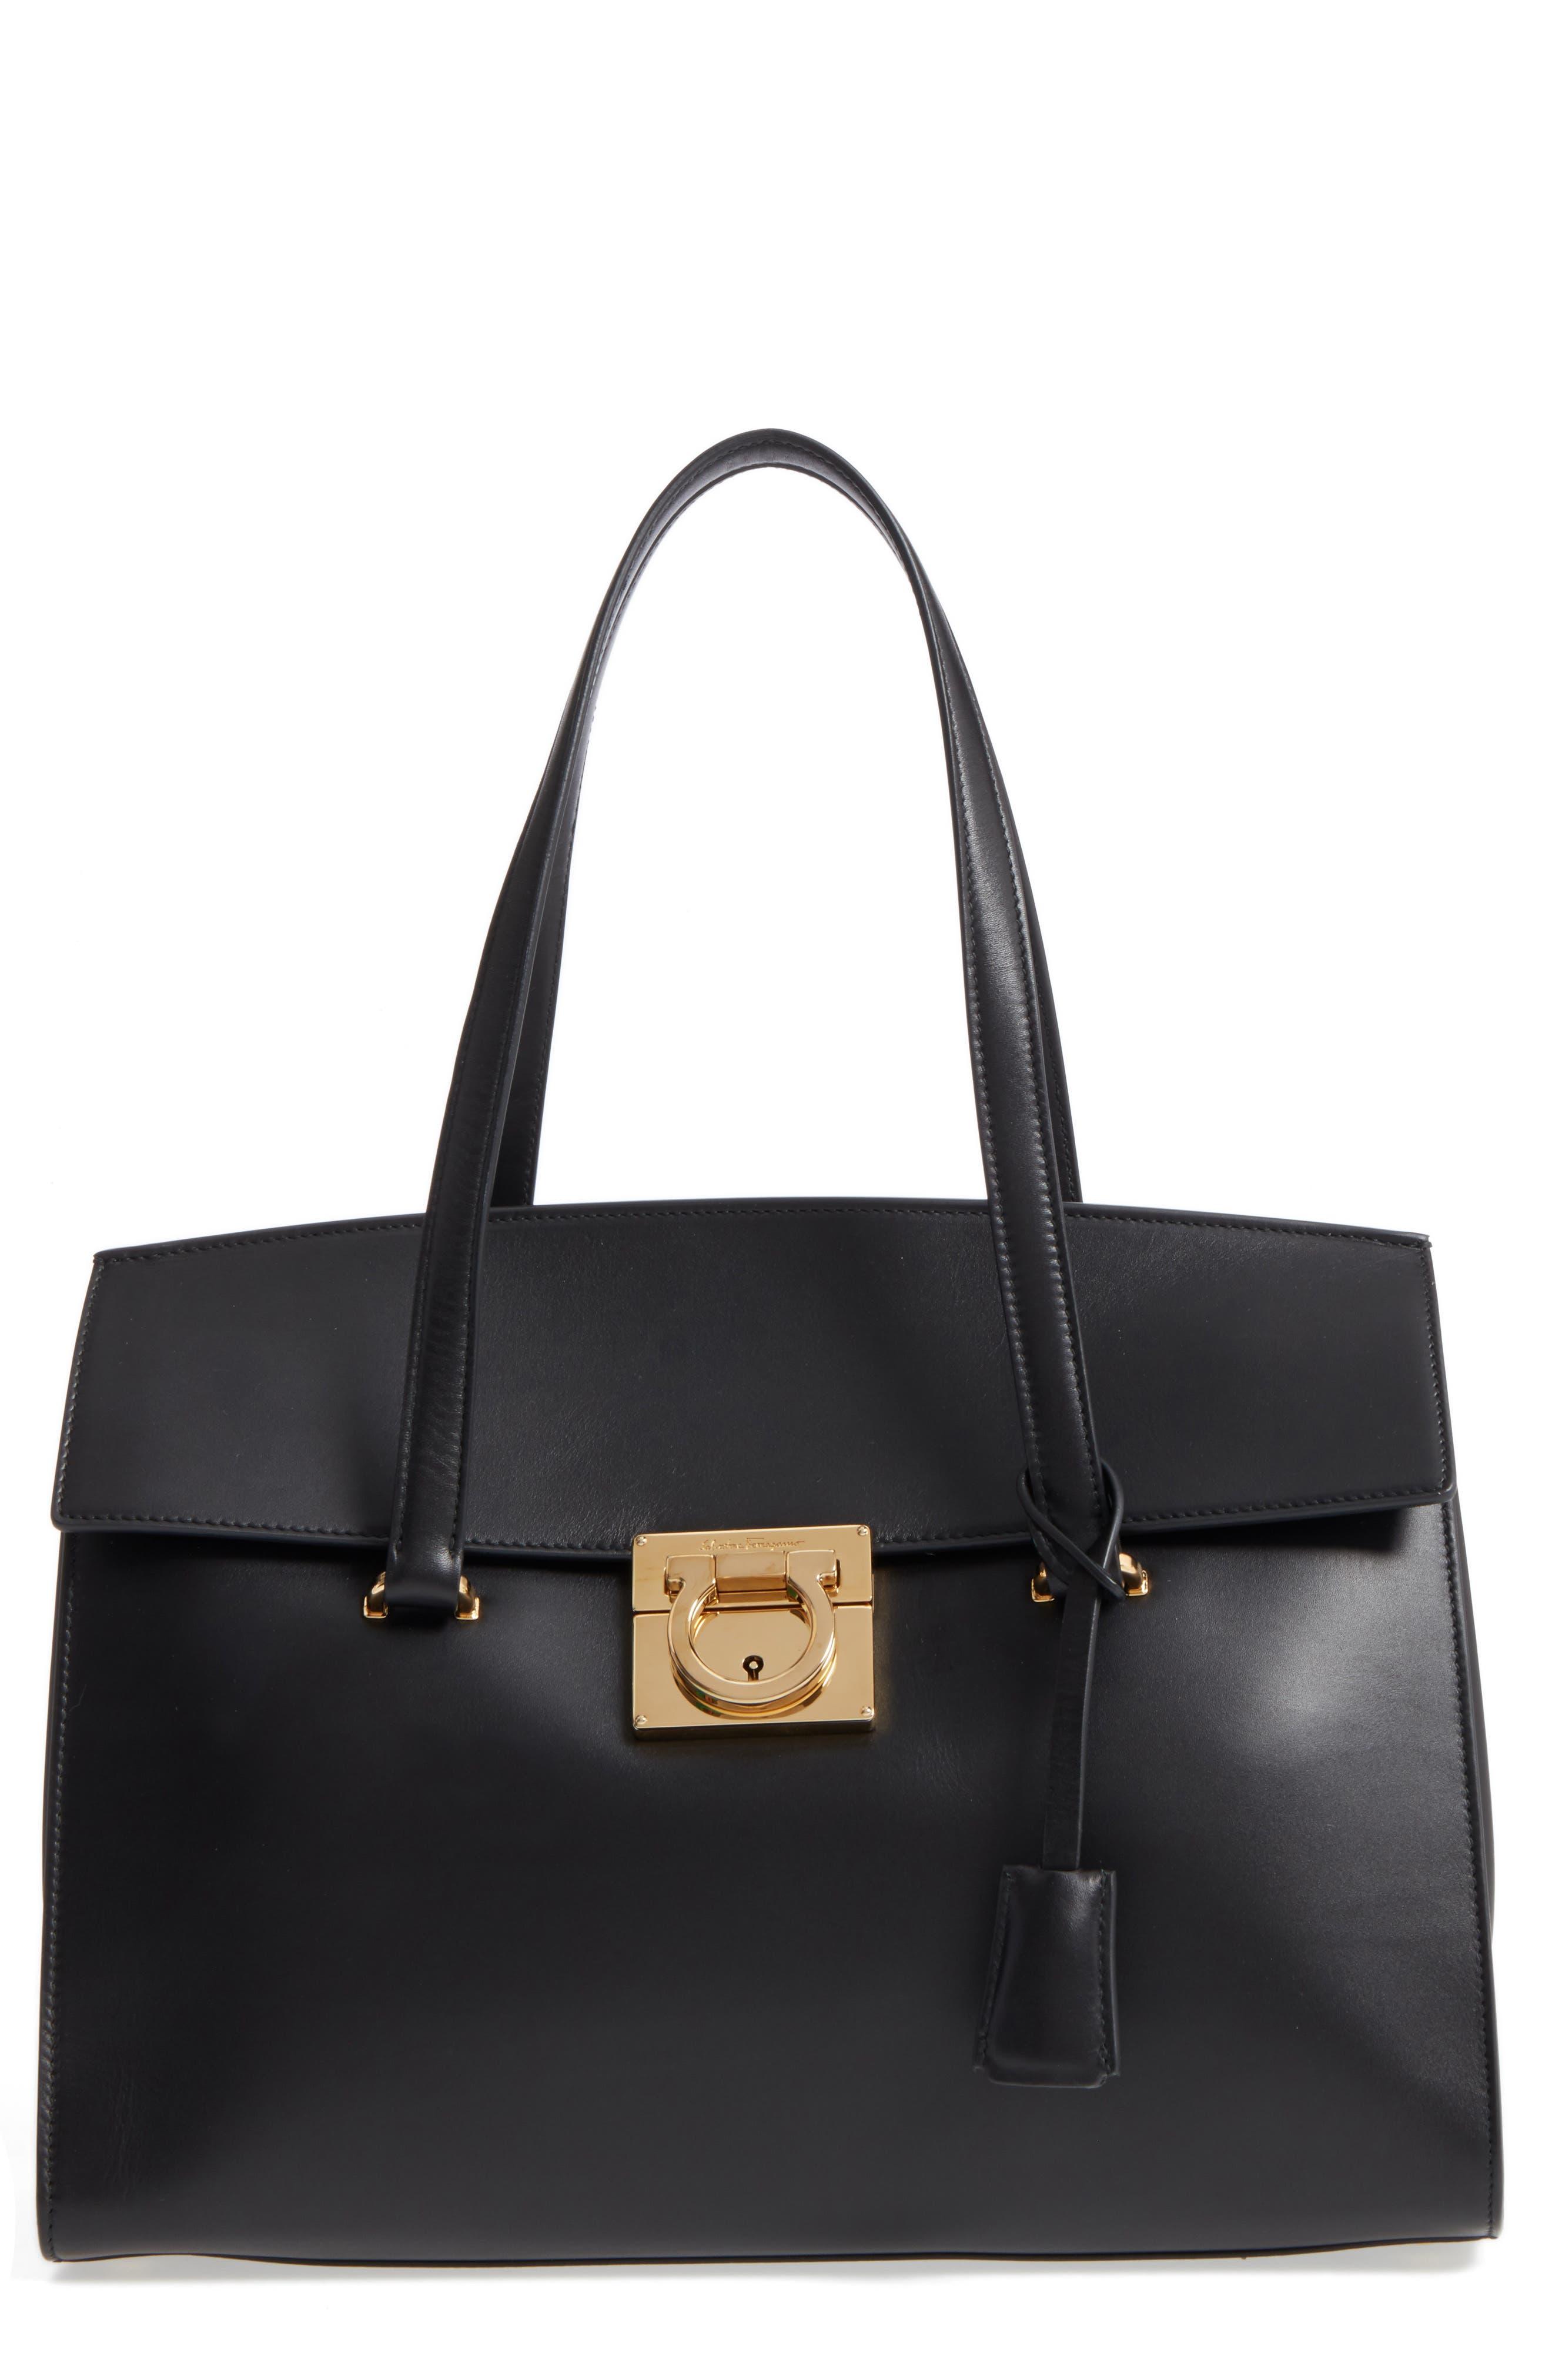 Medium Mara Leather Satchel,                         Main,                         color, 001